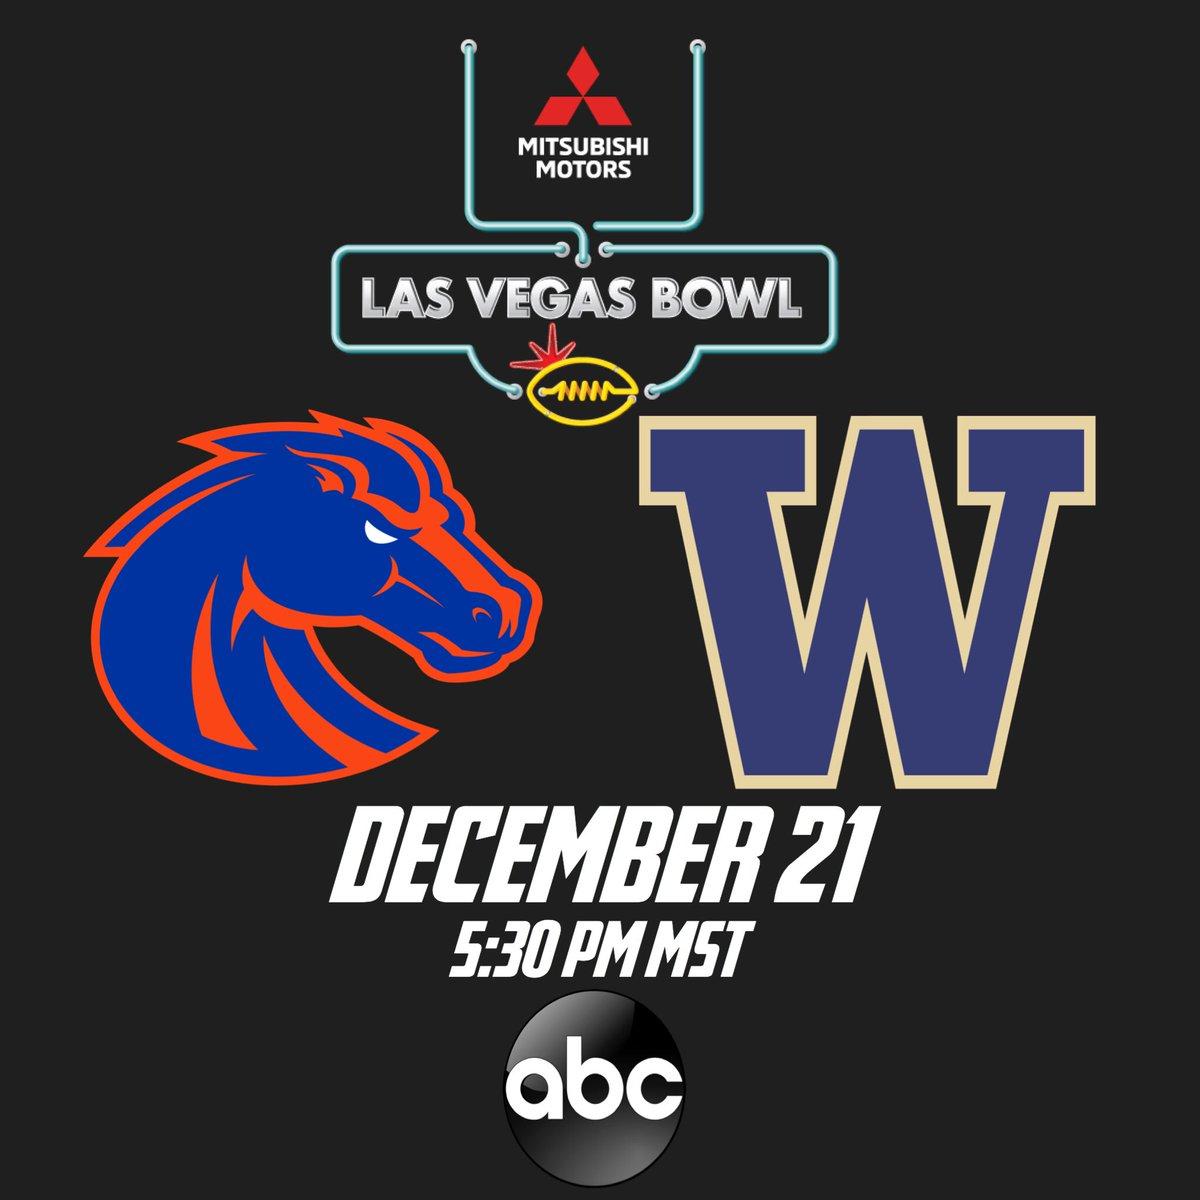 OFFICIAL: Bsu vs Washington in Chris Petersen's final. game vs his old team Boise State. LAS VEGAS BOWL Dec. 21st 7:30 EST ABC <br>http://pic.twitter.com/FMTtOHPxTV